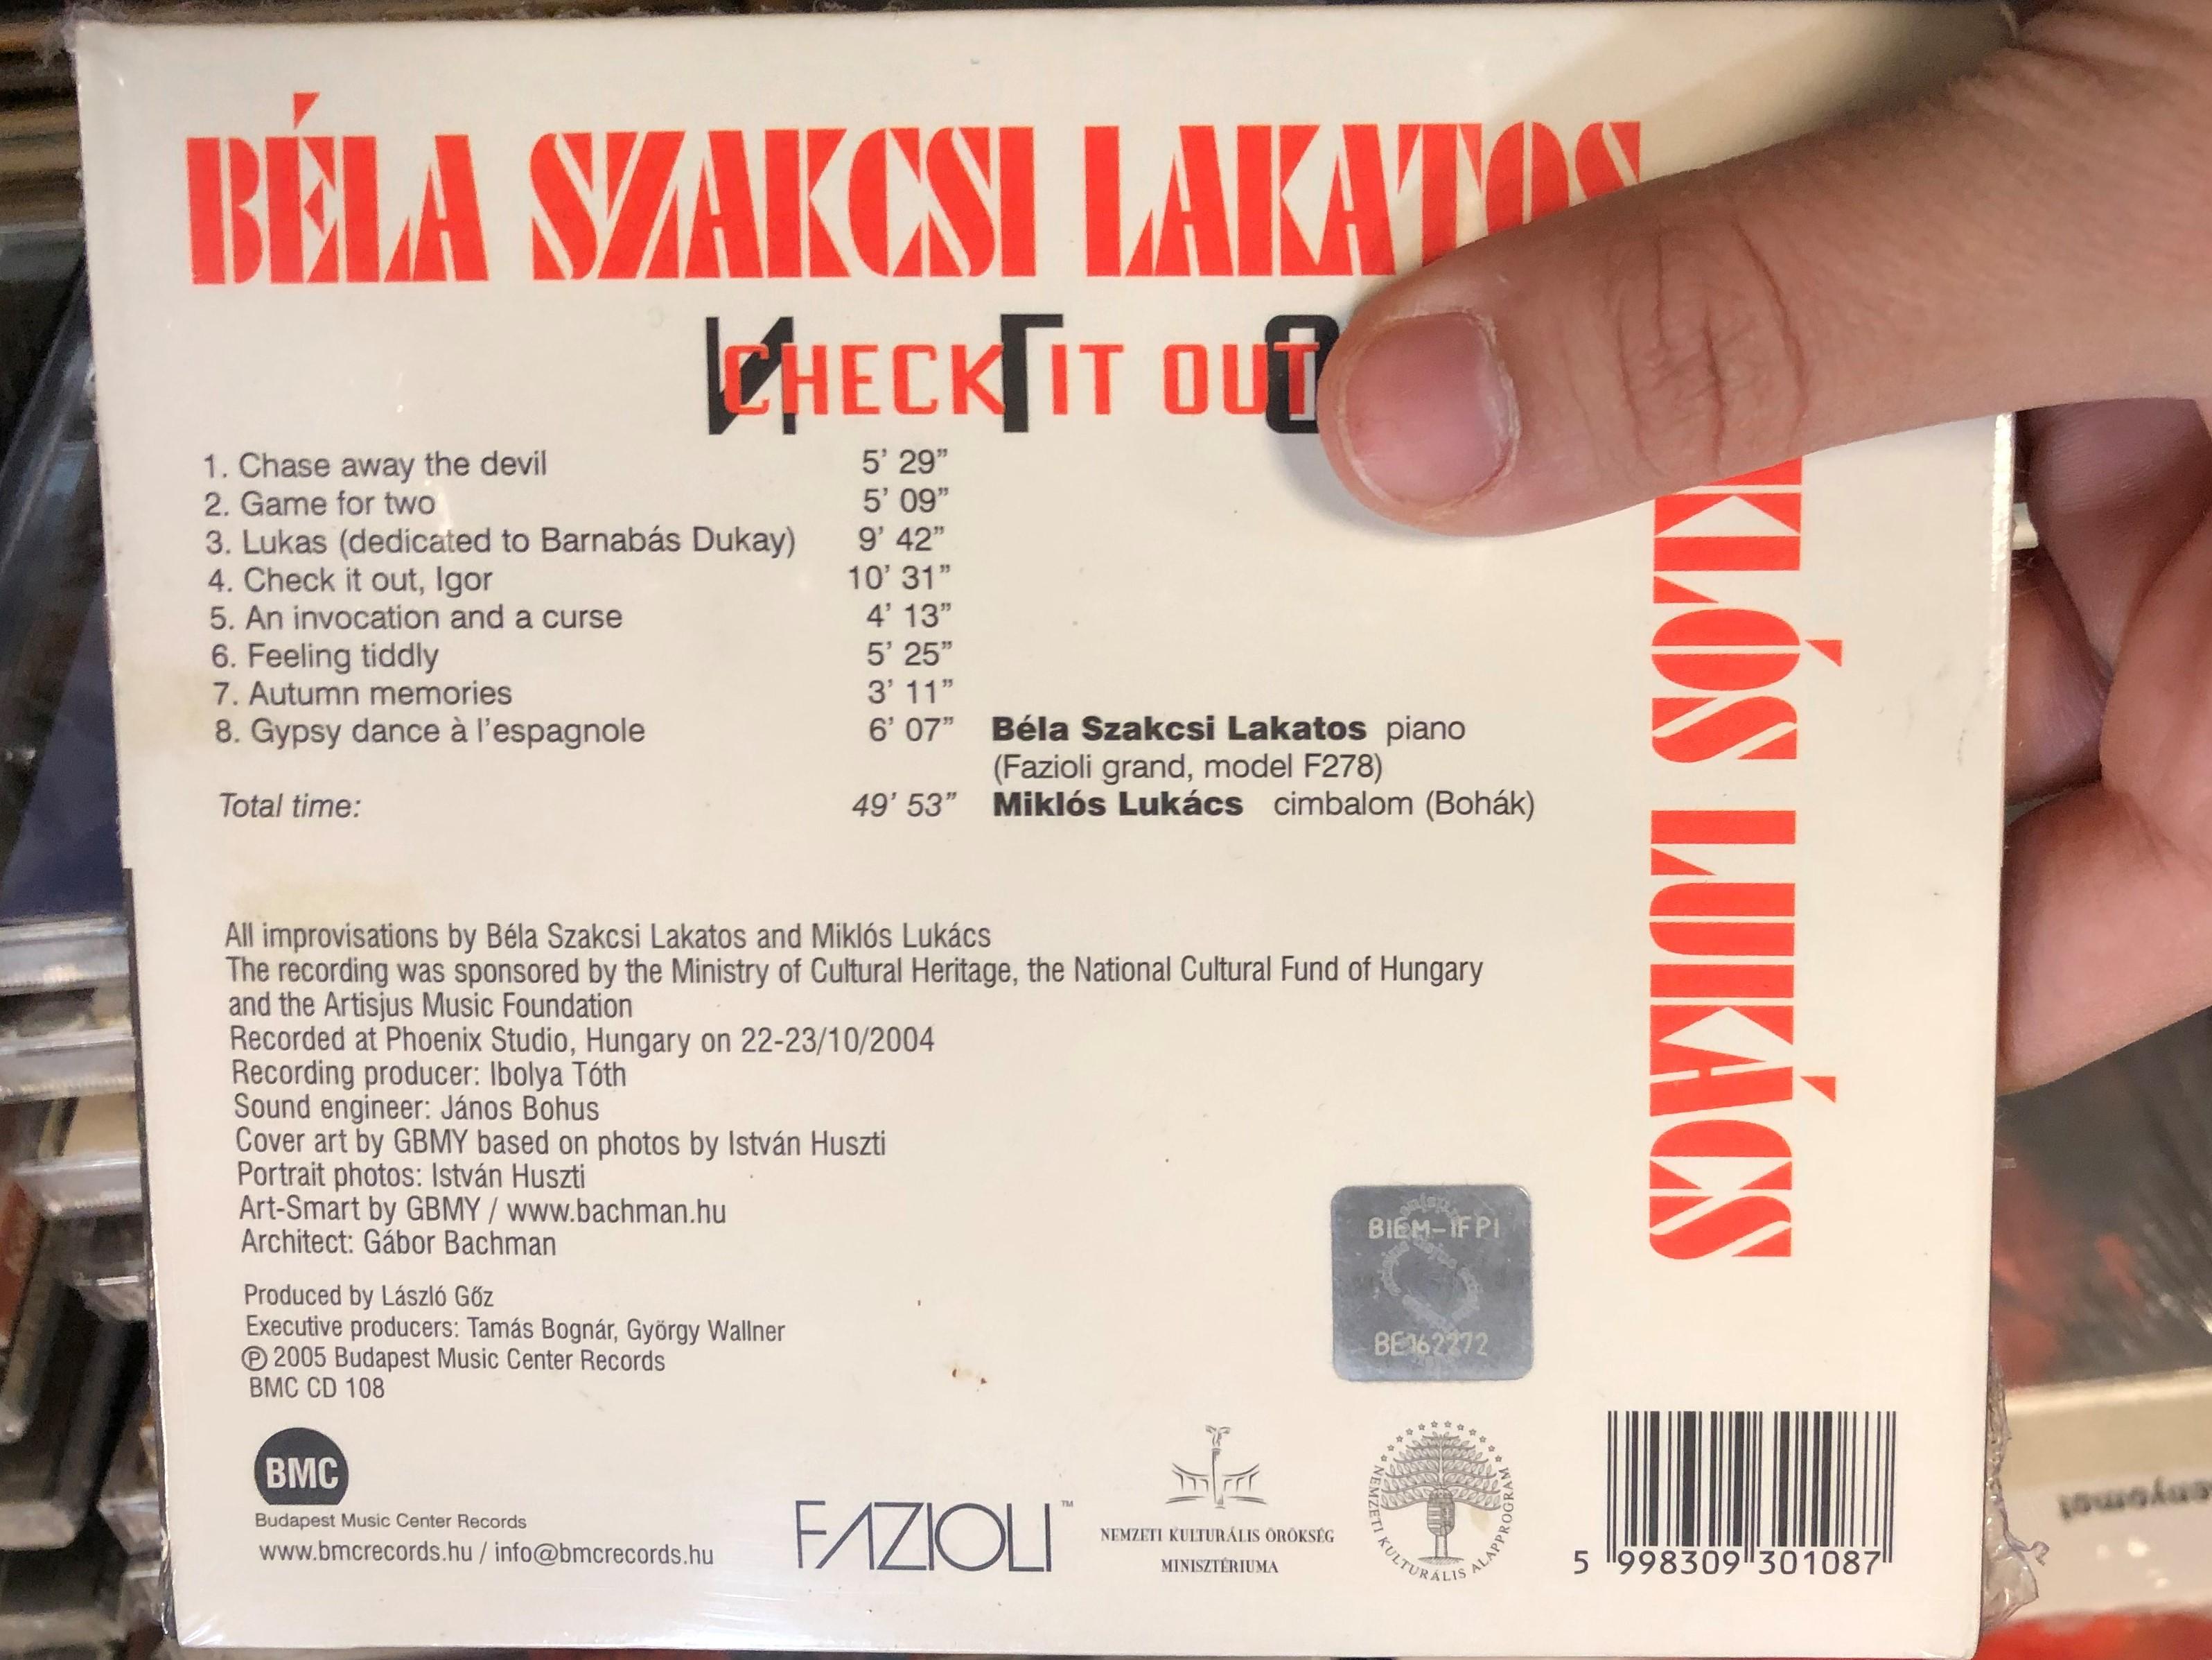 b-la-szakcsi-lakatos-mikl-s-luk-cs-check-it-out-igor-budapest-music-center-records-audio-cd-2005-bmc-cd-108-2-.jpg